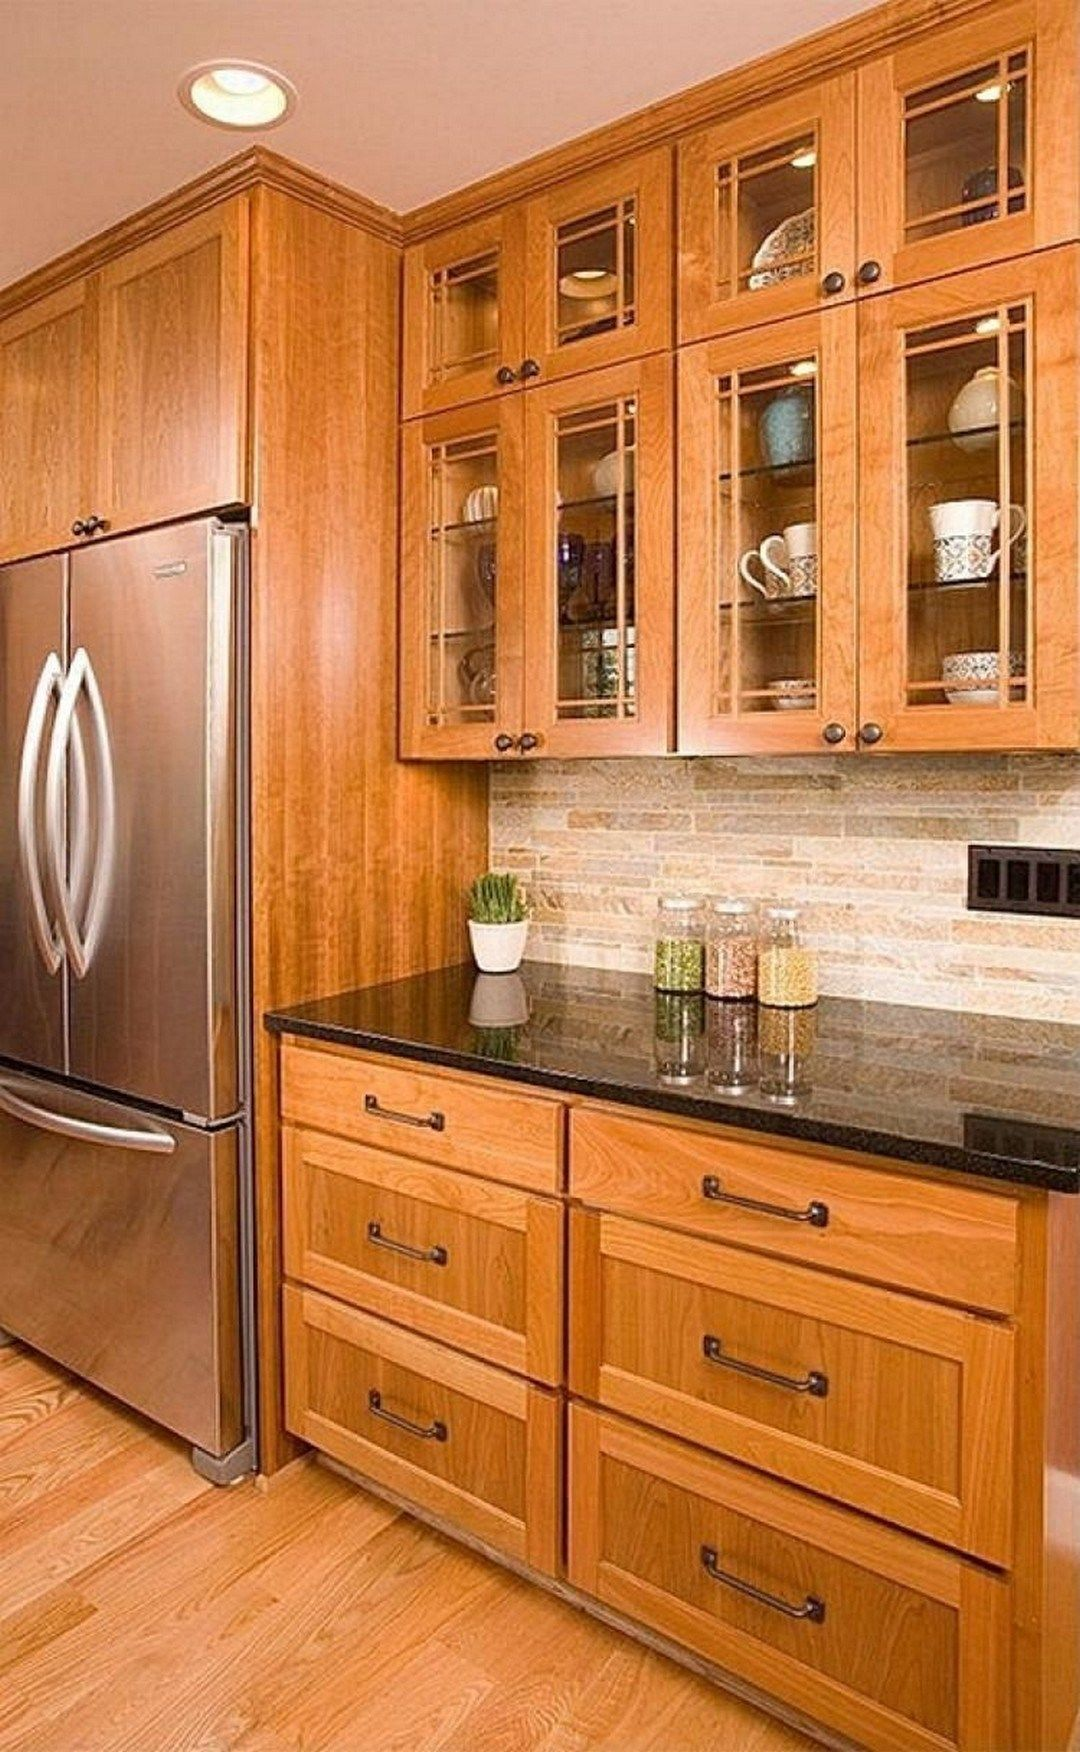 Best 29 Fantastic Kitchen Backsplash Ideas With Oak Cabinets 3 400 x 300